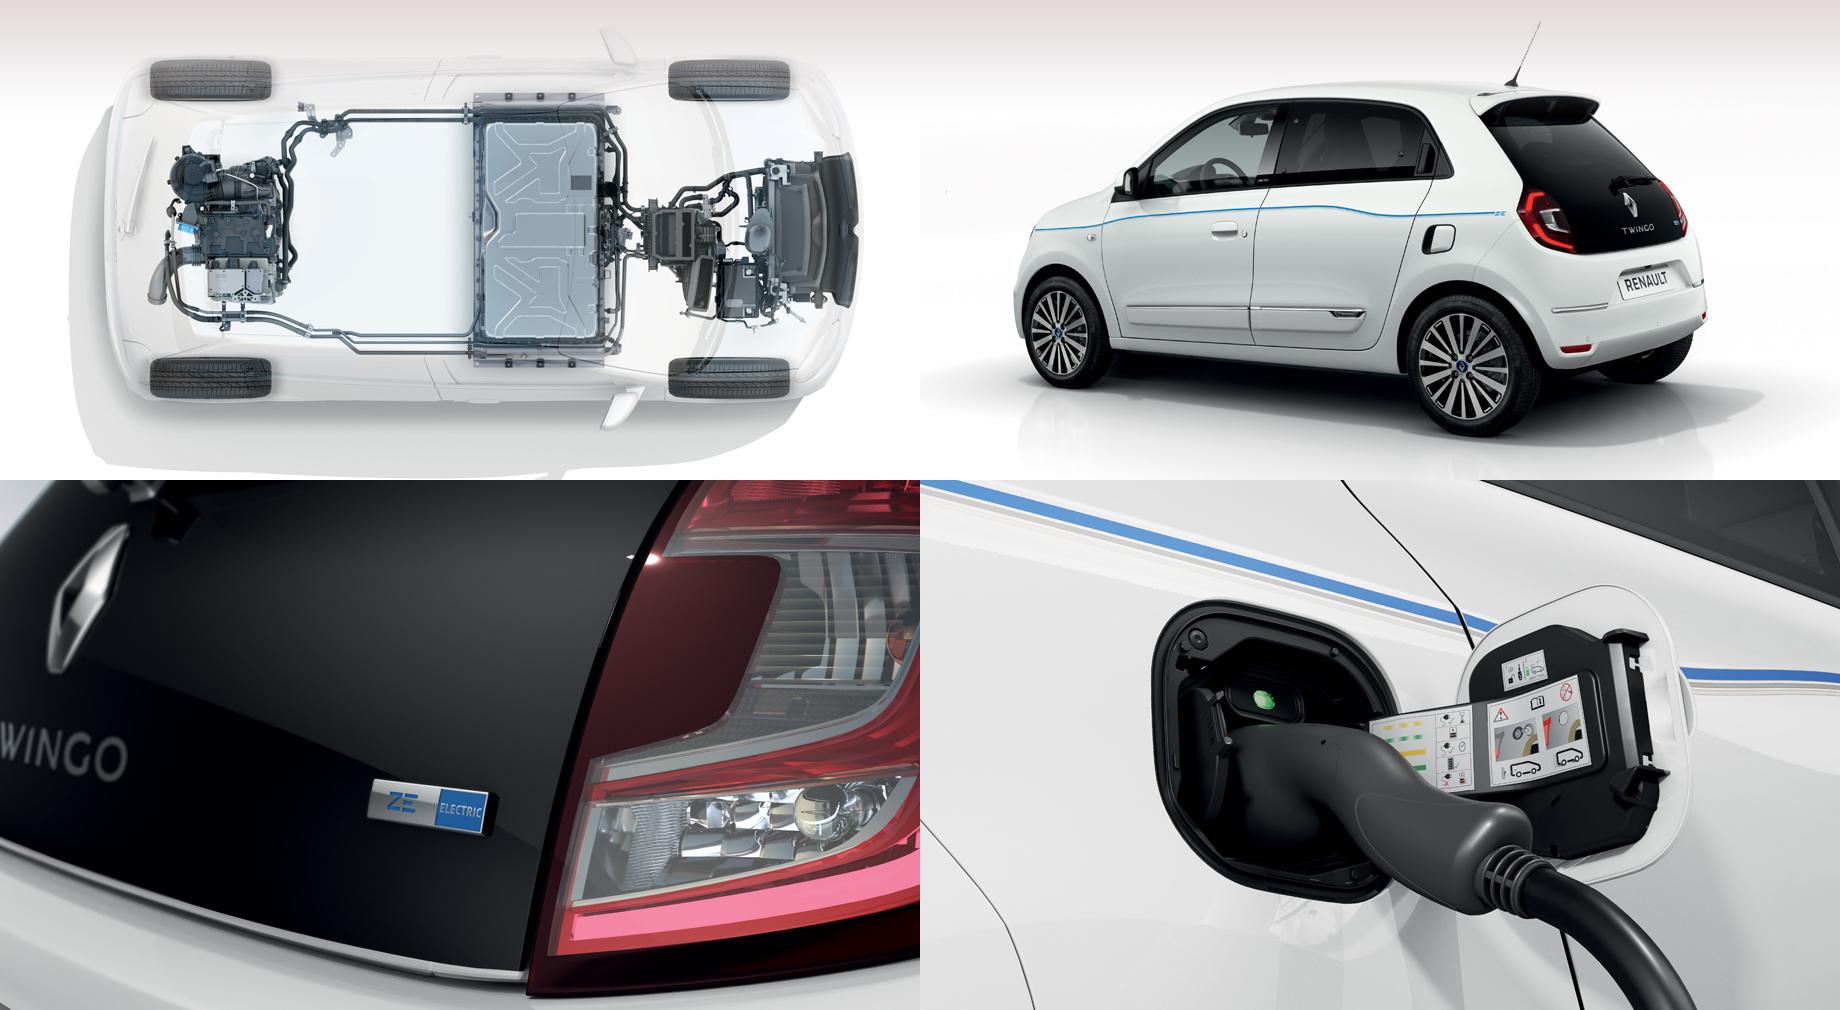 Электрокар Renault Twingo Z.E. отличился отСмарта EQ батареей